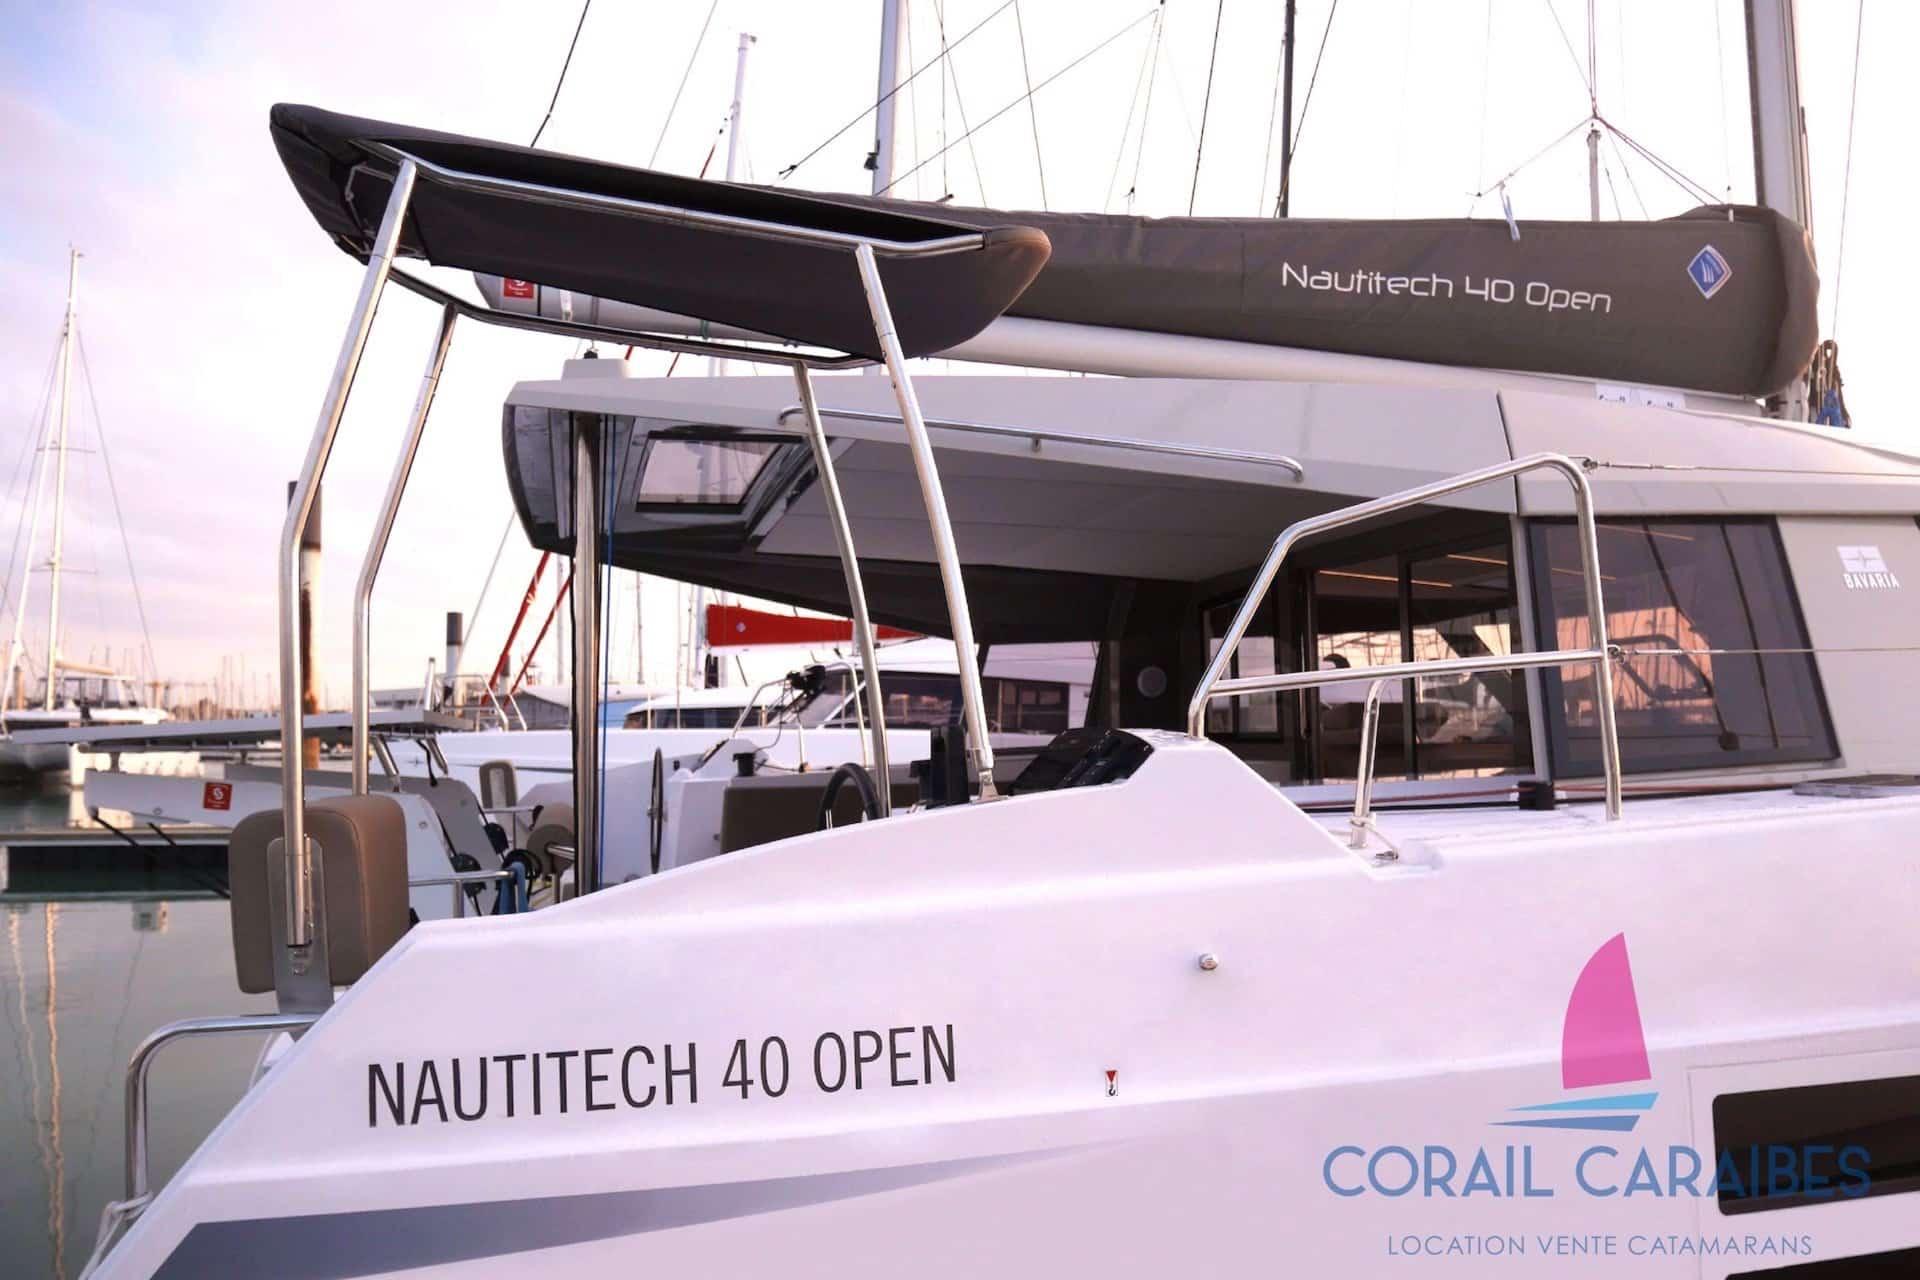 Nautitech-40-Open-Corail-Caraibes-15